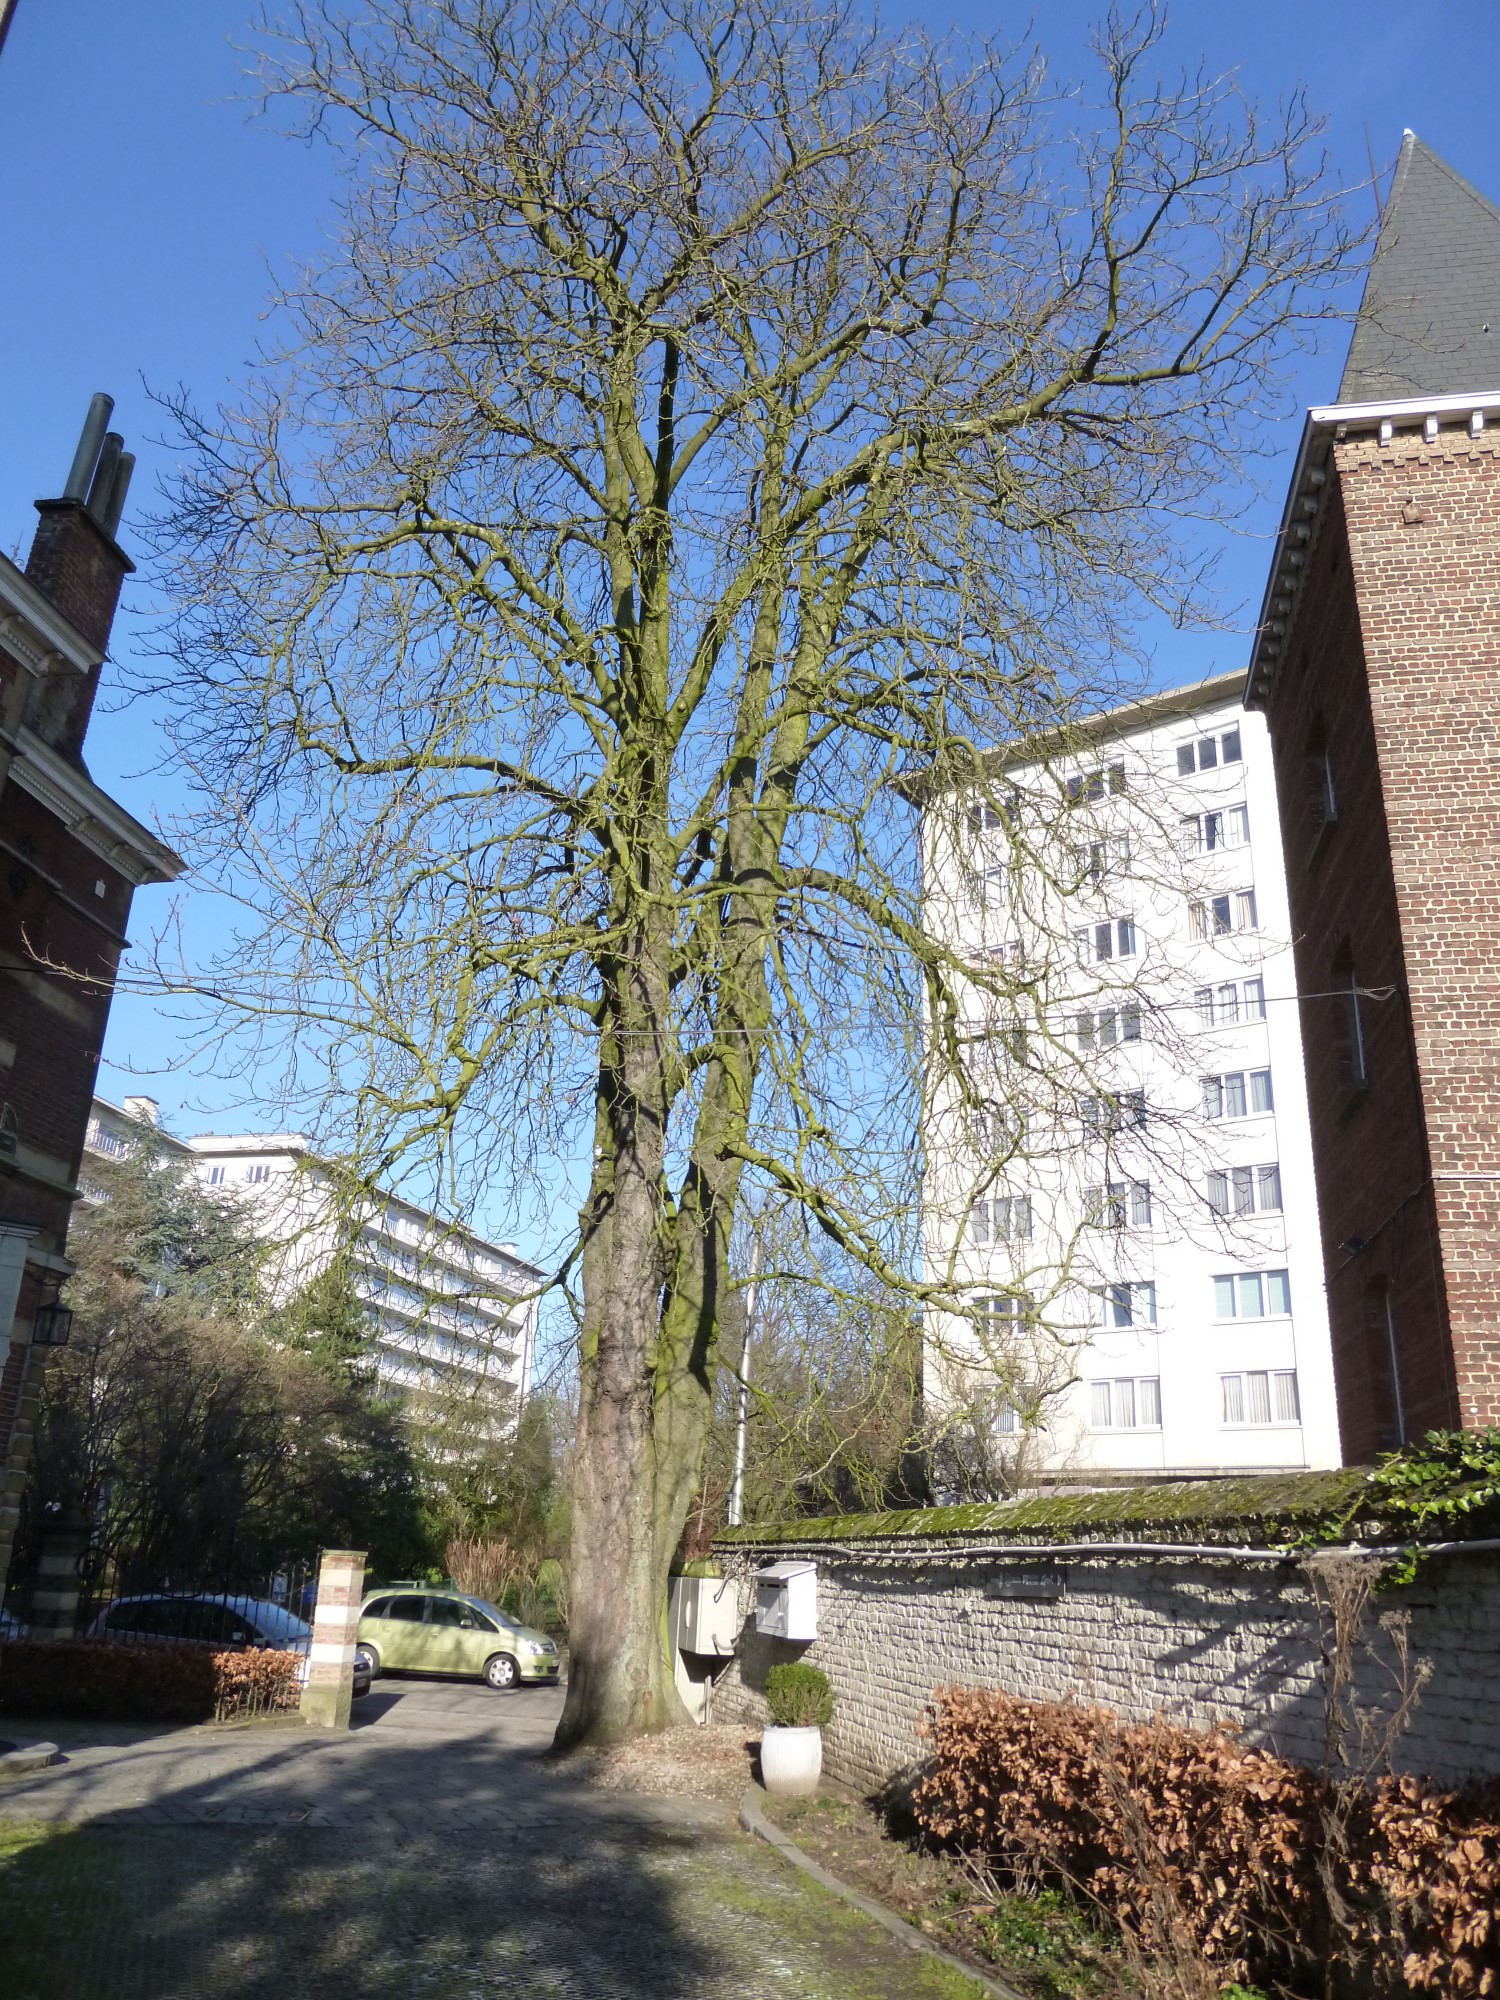 Marronnier commun – Uccle, Domaine Allard, Rue Victor Allard, 88 –  18 Février 2013